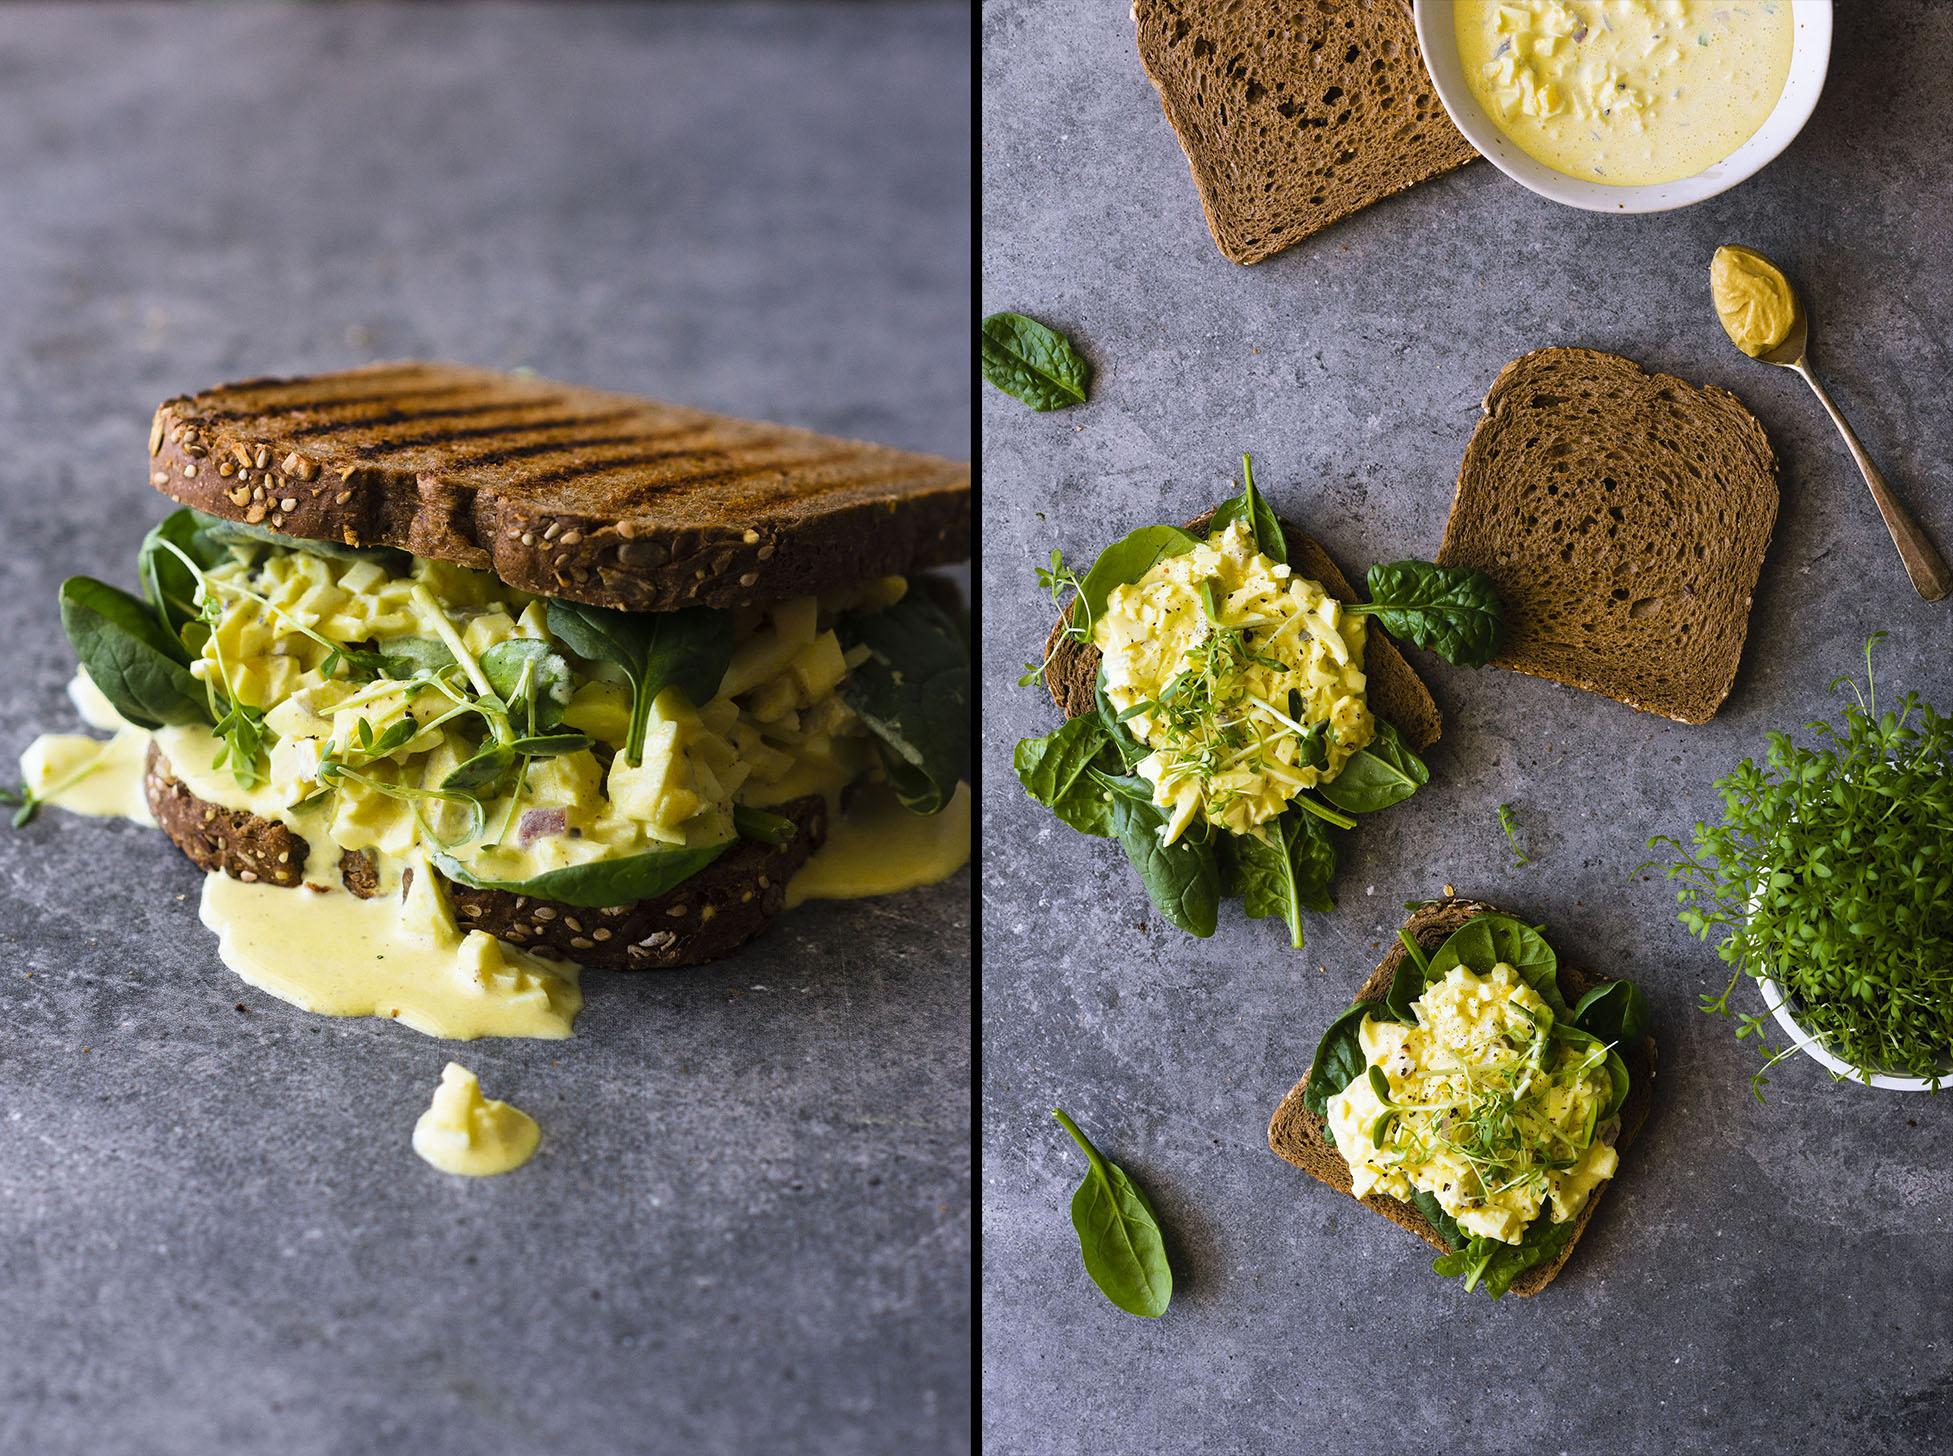 Easy, healthy Turmeric Egg Salad